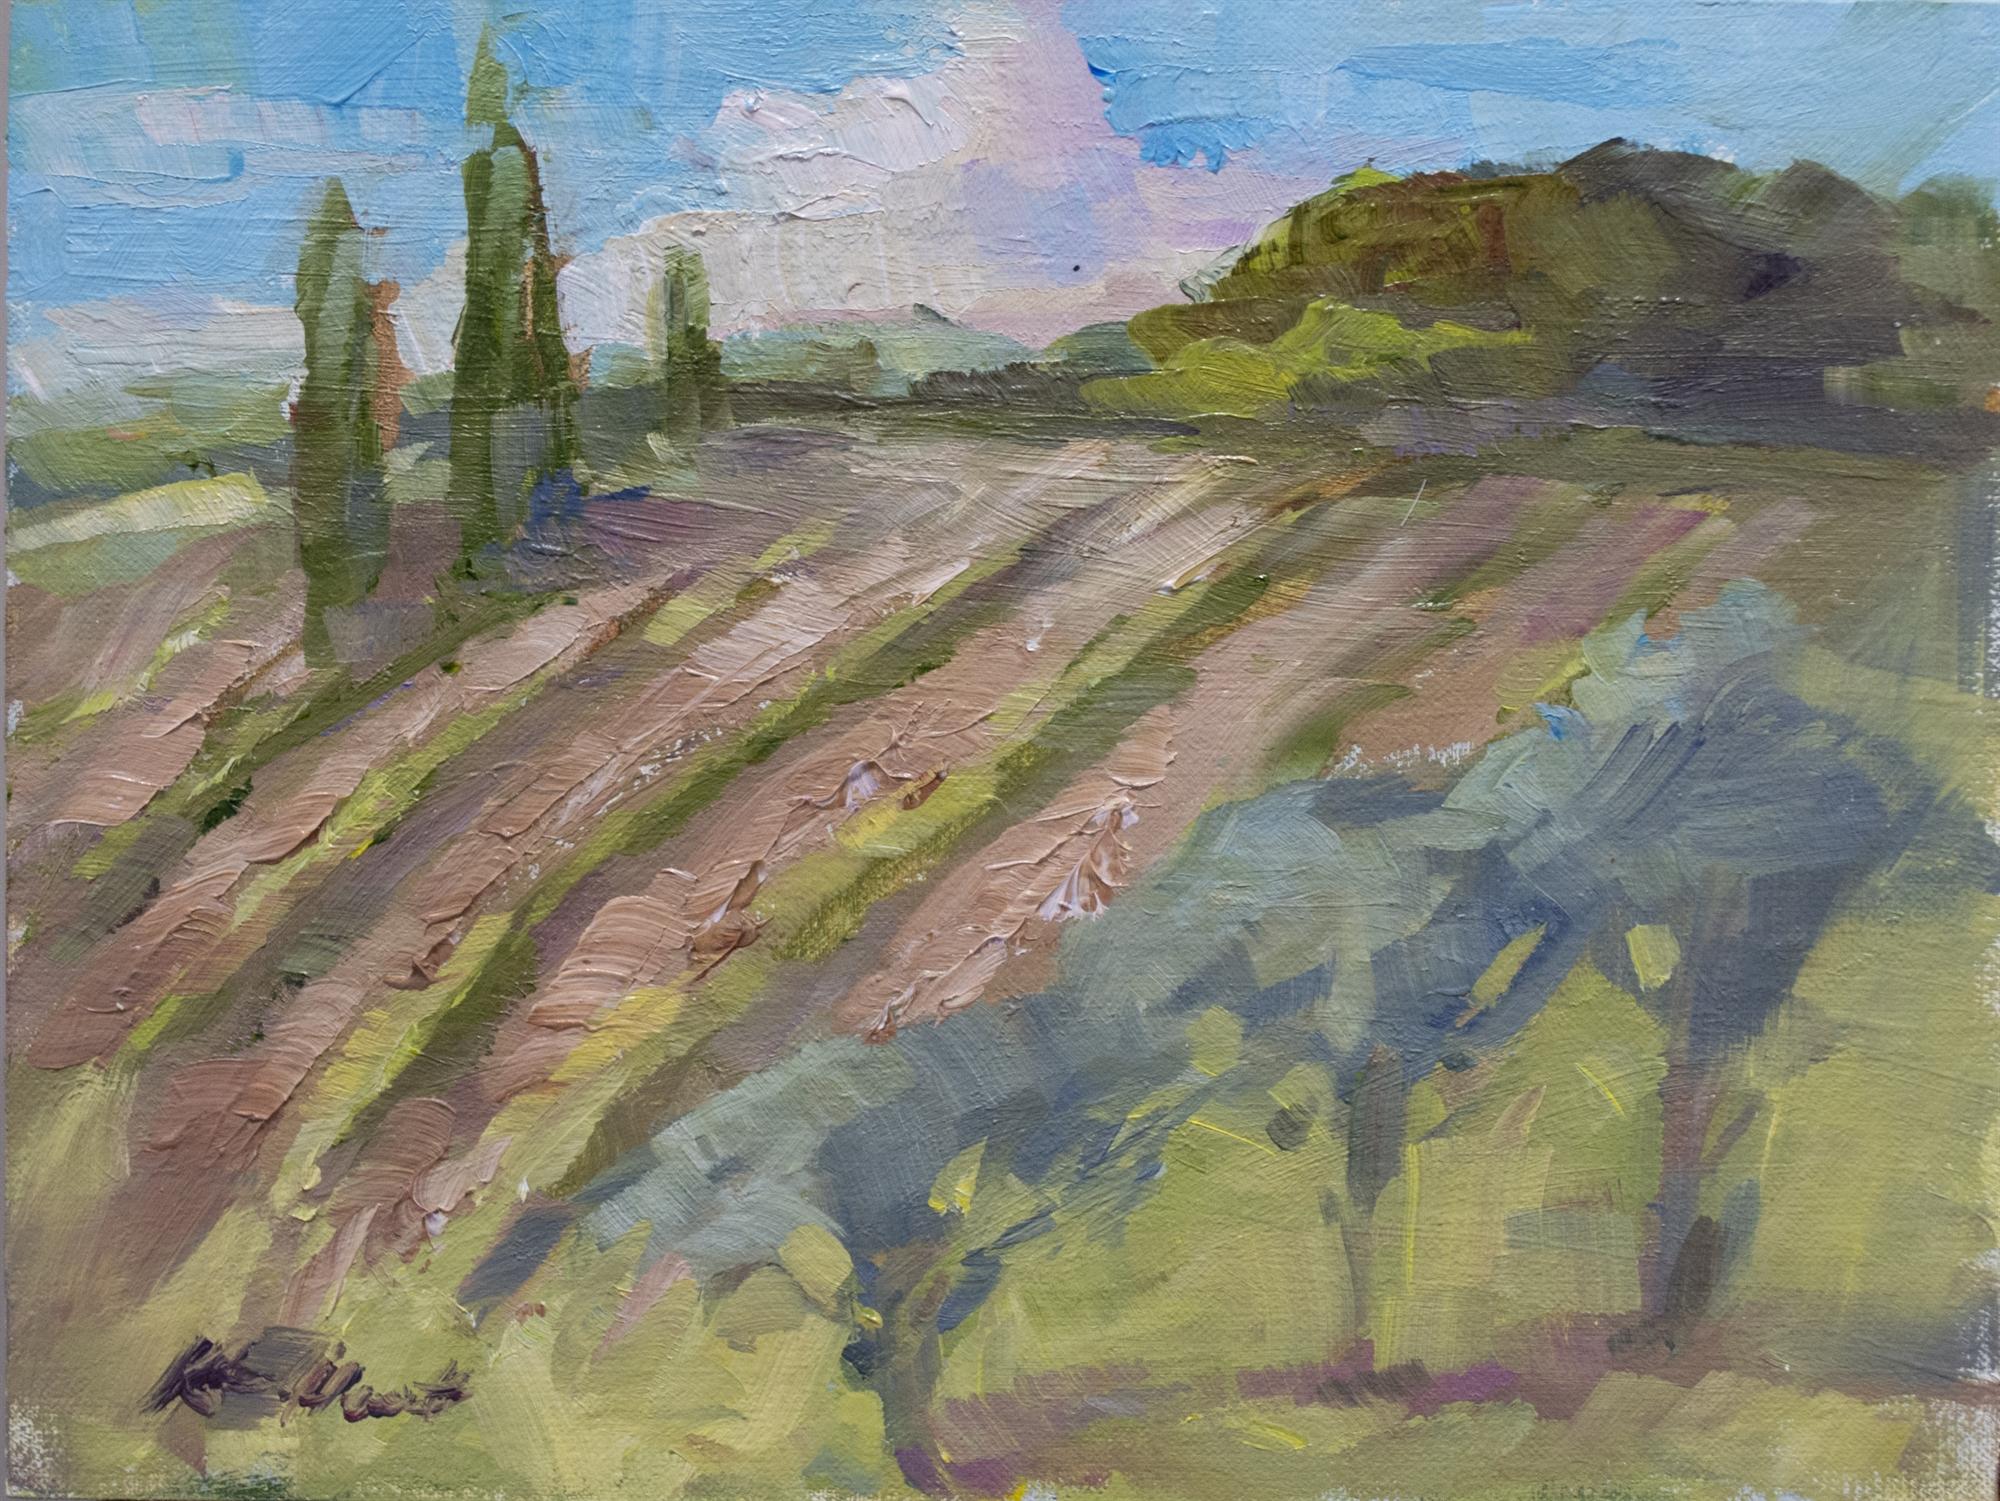 Up the Hill at the Contessa by Karen Hewitt Hagan